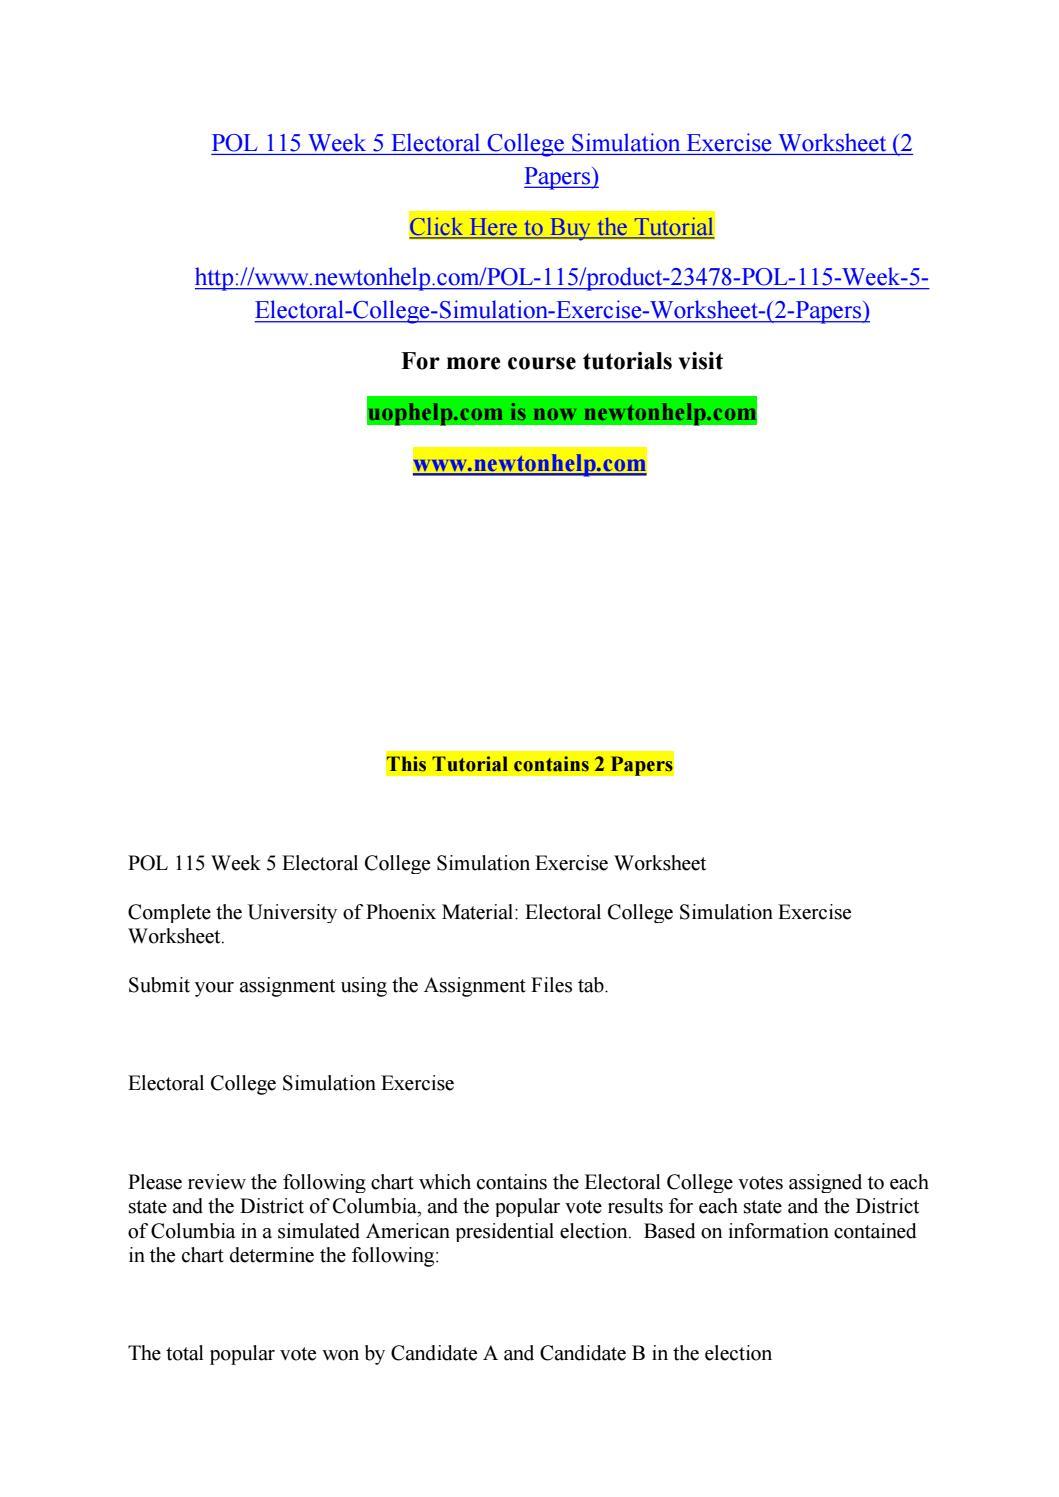 worksheet Electoral College Worksheet pol 115 week 5 electoral college simulation exercise worksheet 2 papers by bottlebrushcallistemon issuu